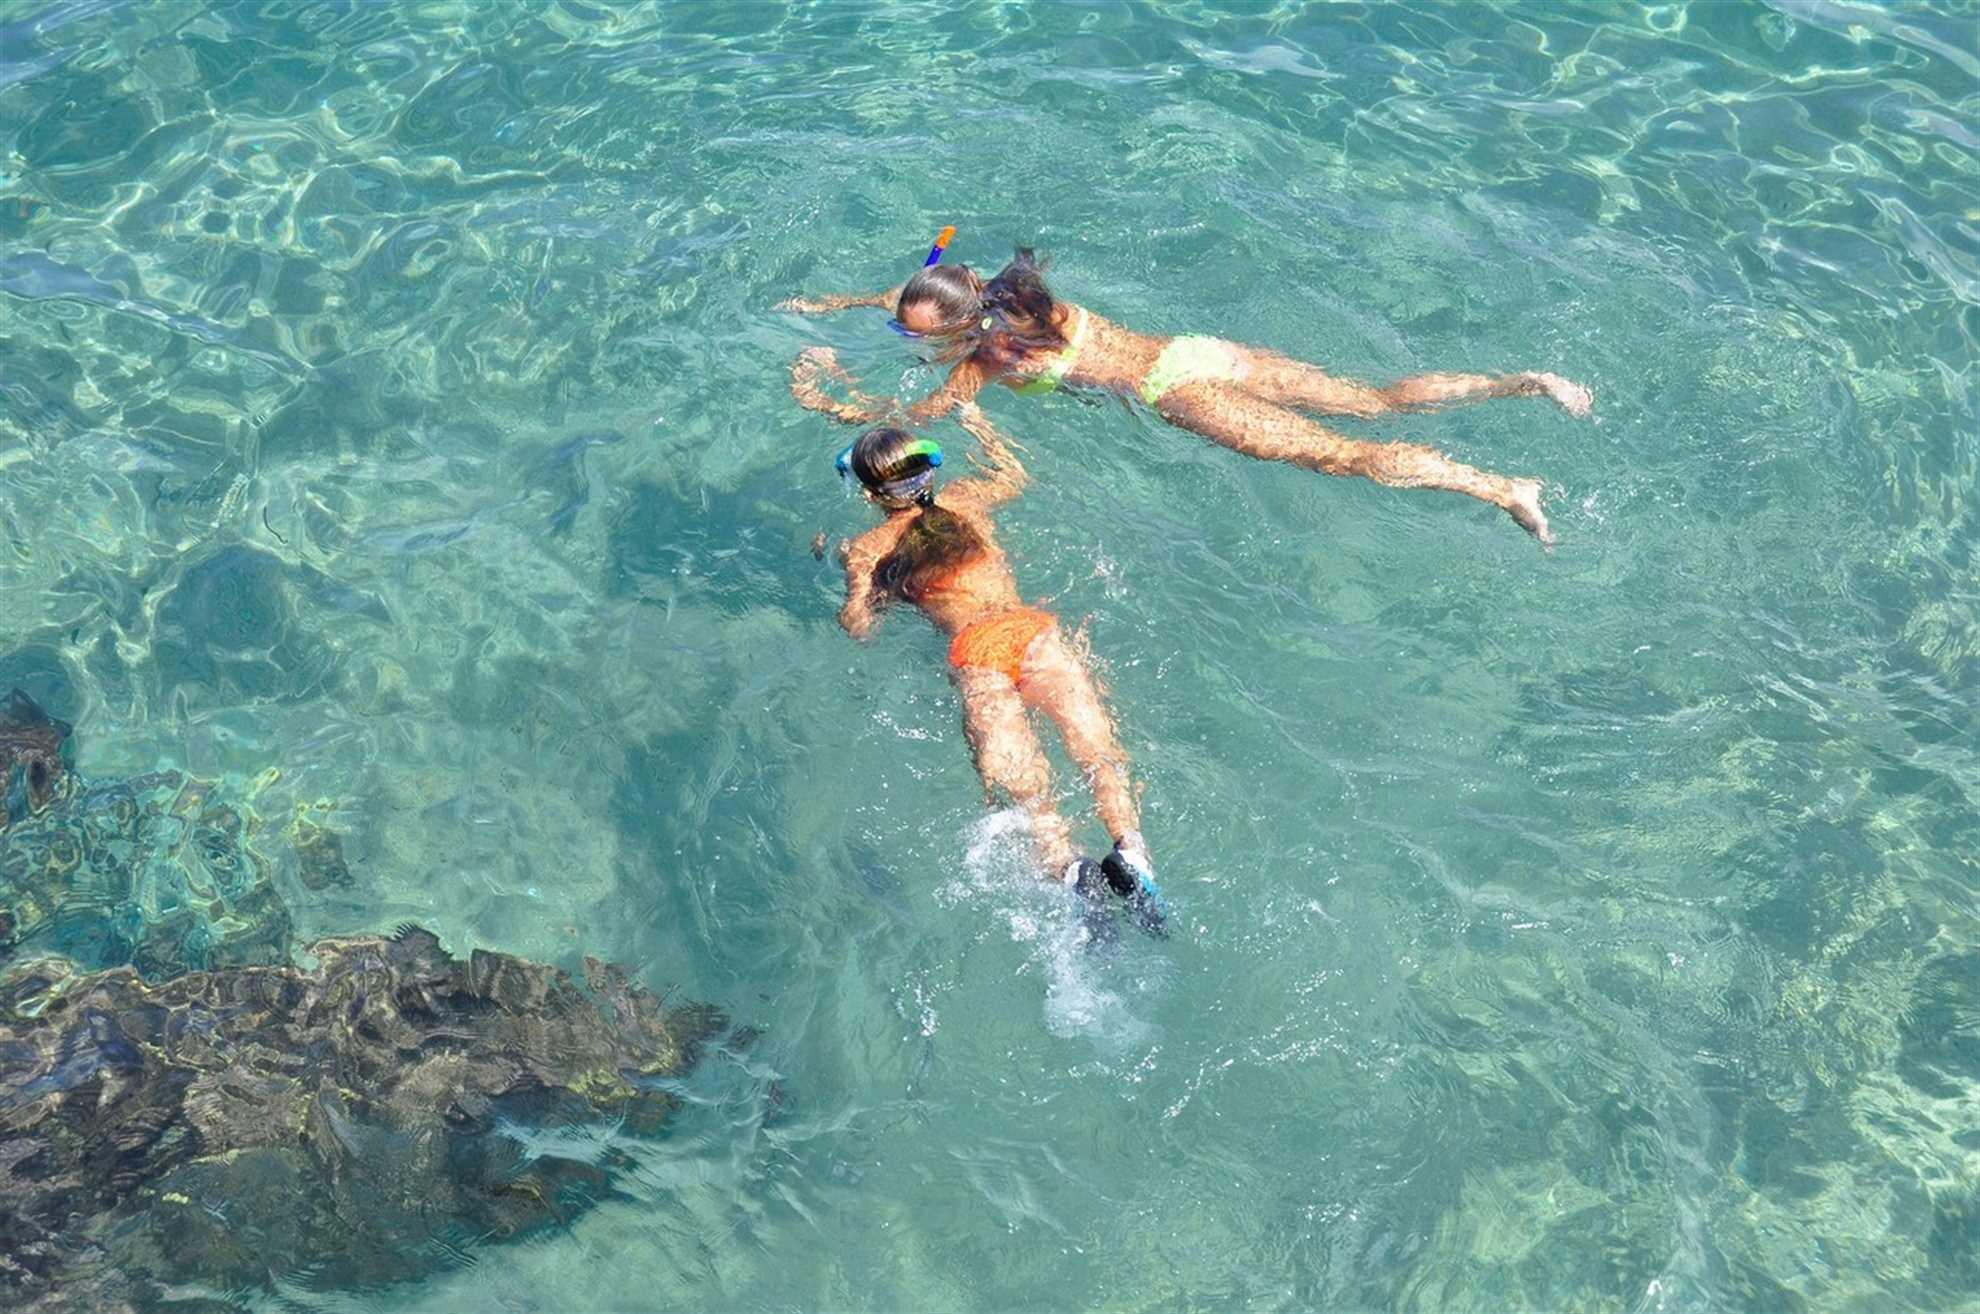 Children Snorkeling in the Adriatic Sea